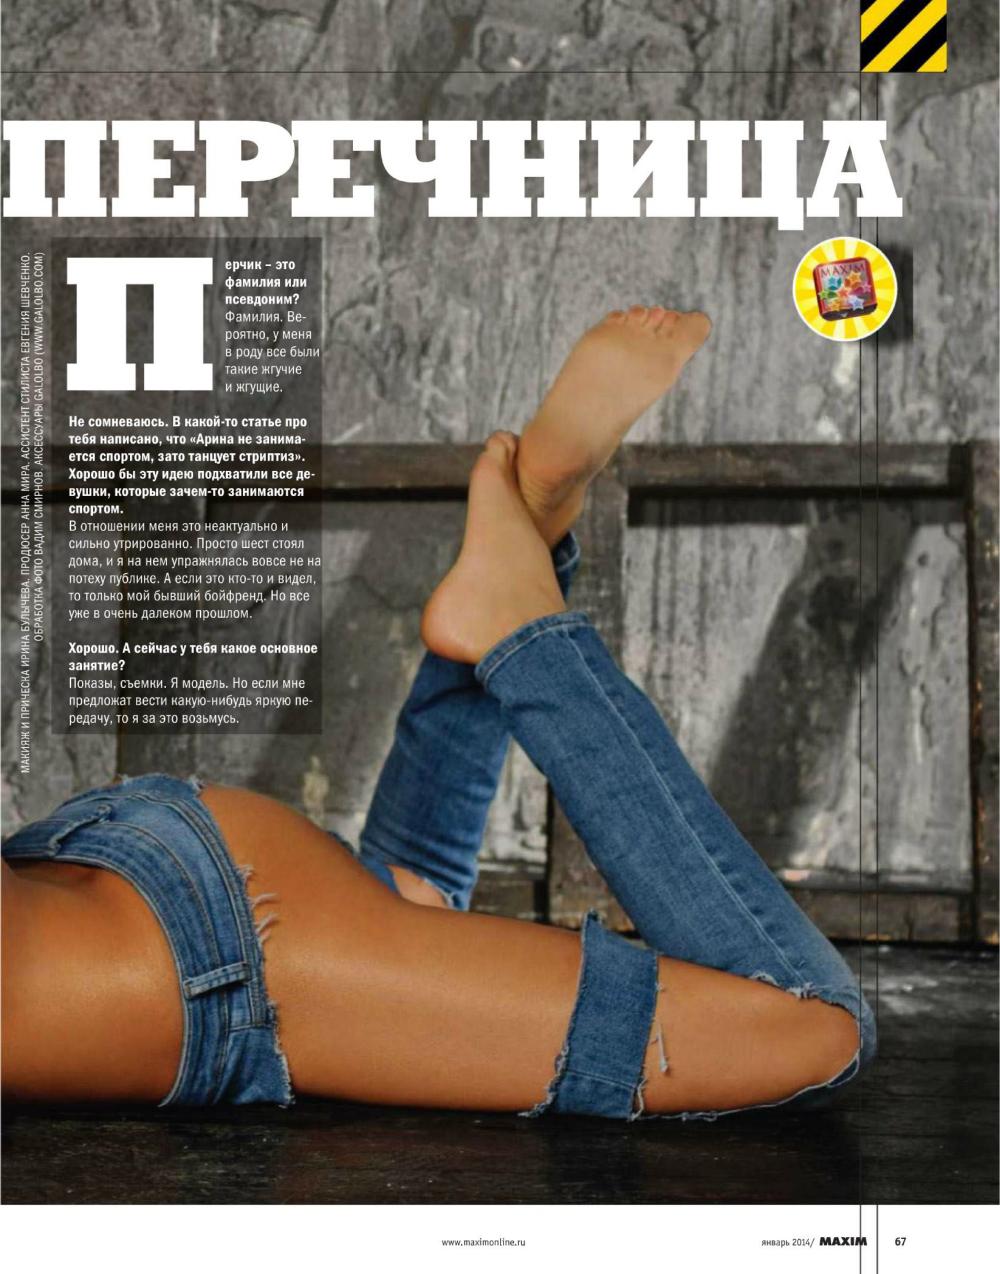 http://i2.imageban.ru/out/2013/12/17/bce97c99b3f7f4506a2ad883df710c65.jpg